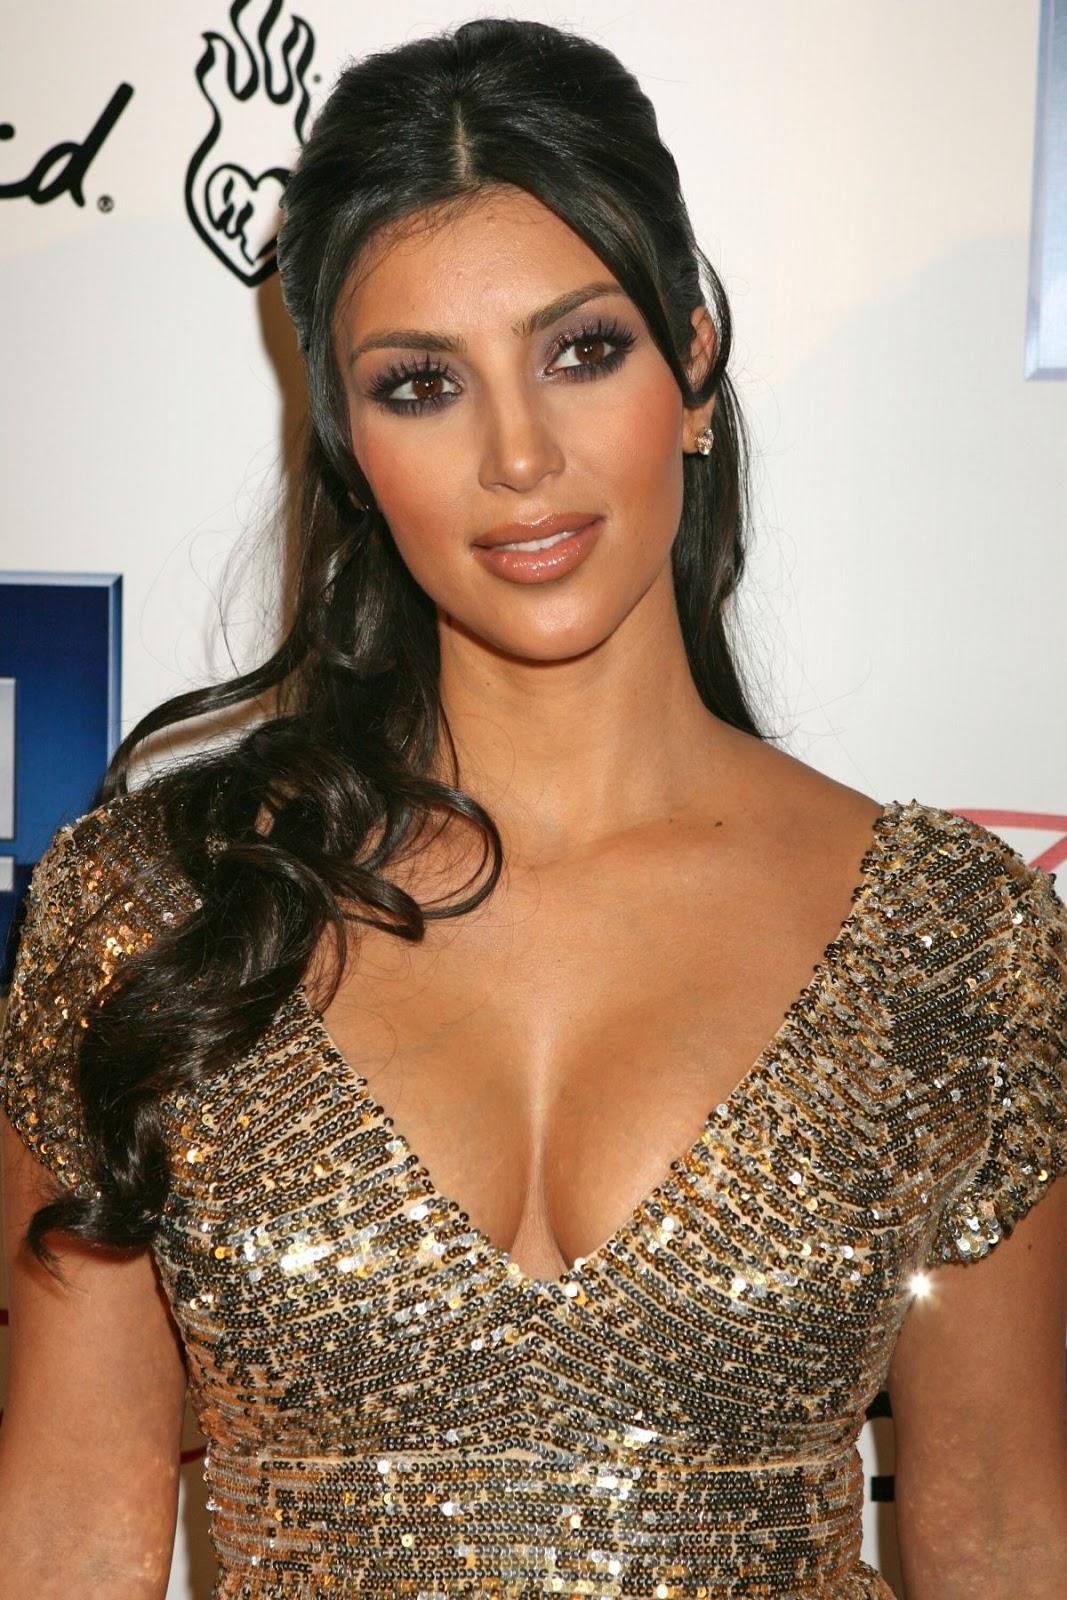 Kim kardashian date of birth